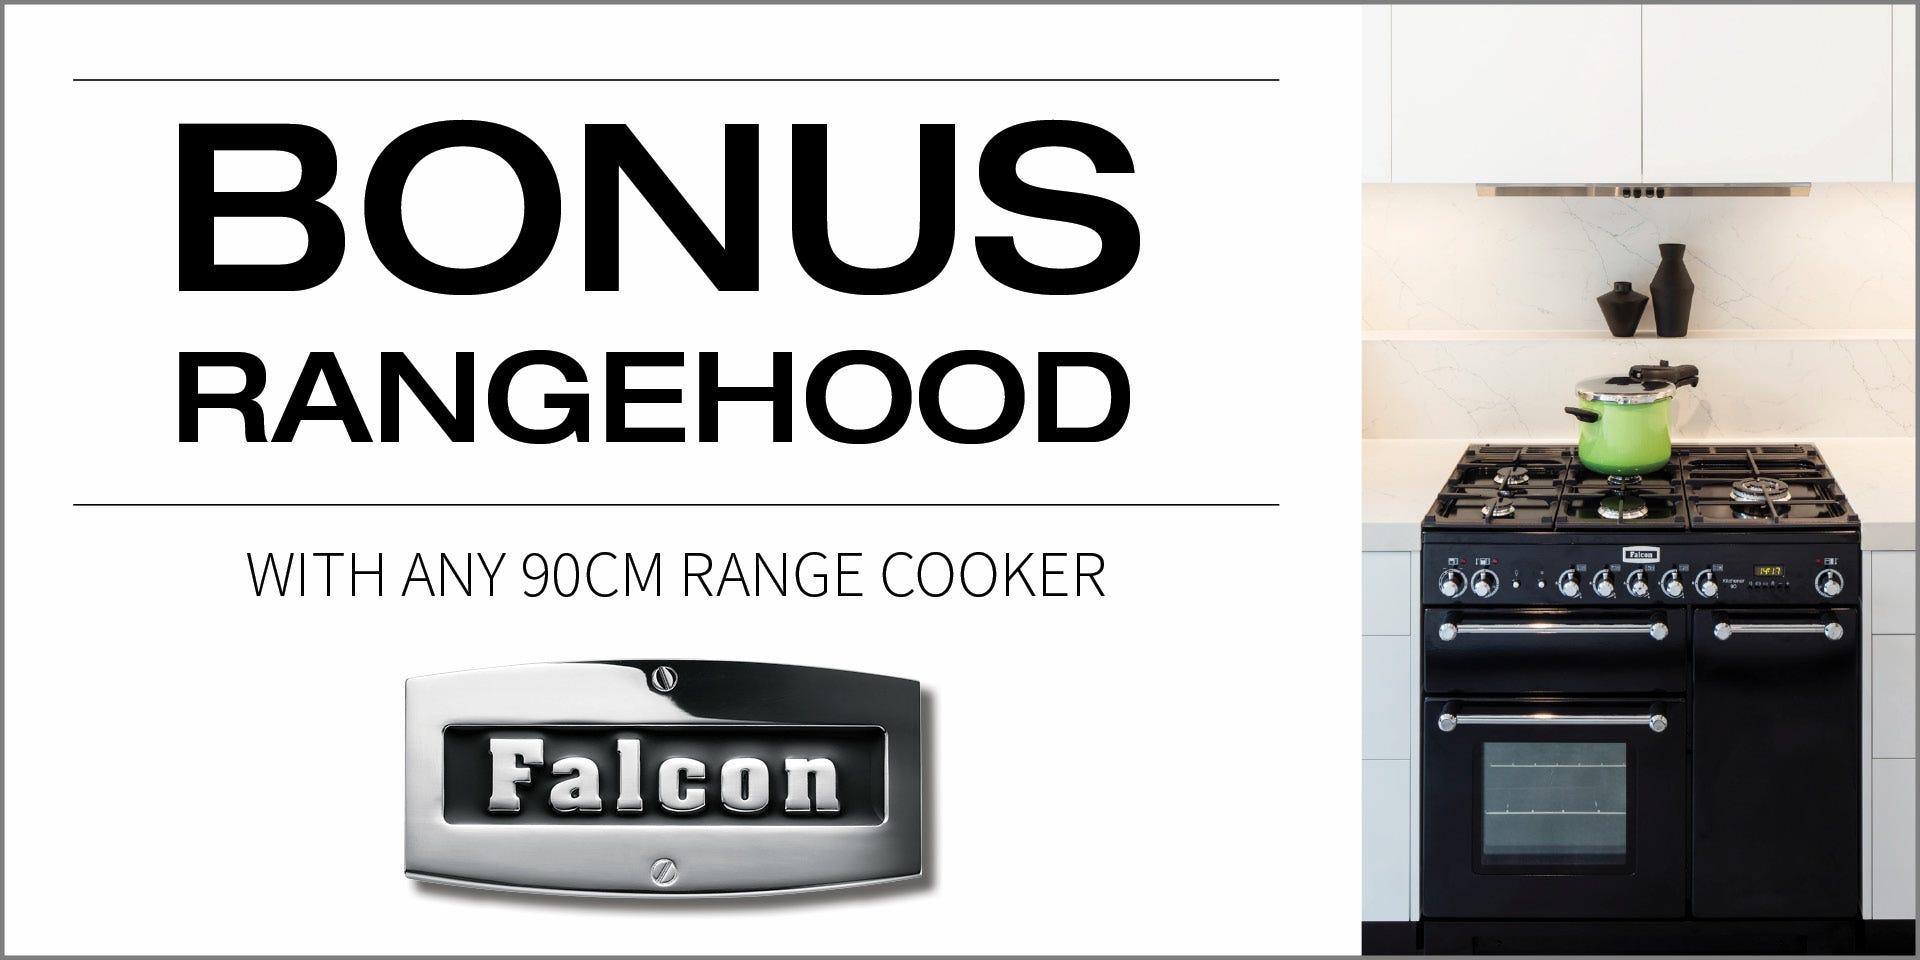 Bonus Rangehood with any Falcon 90cm Range Cooker. Conditions apply - ENDS 28/01/20